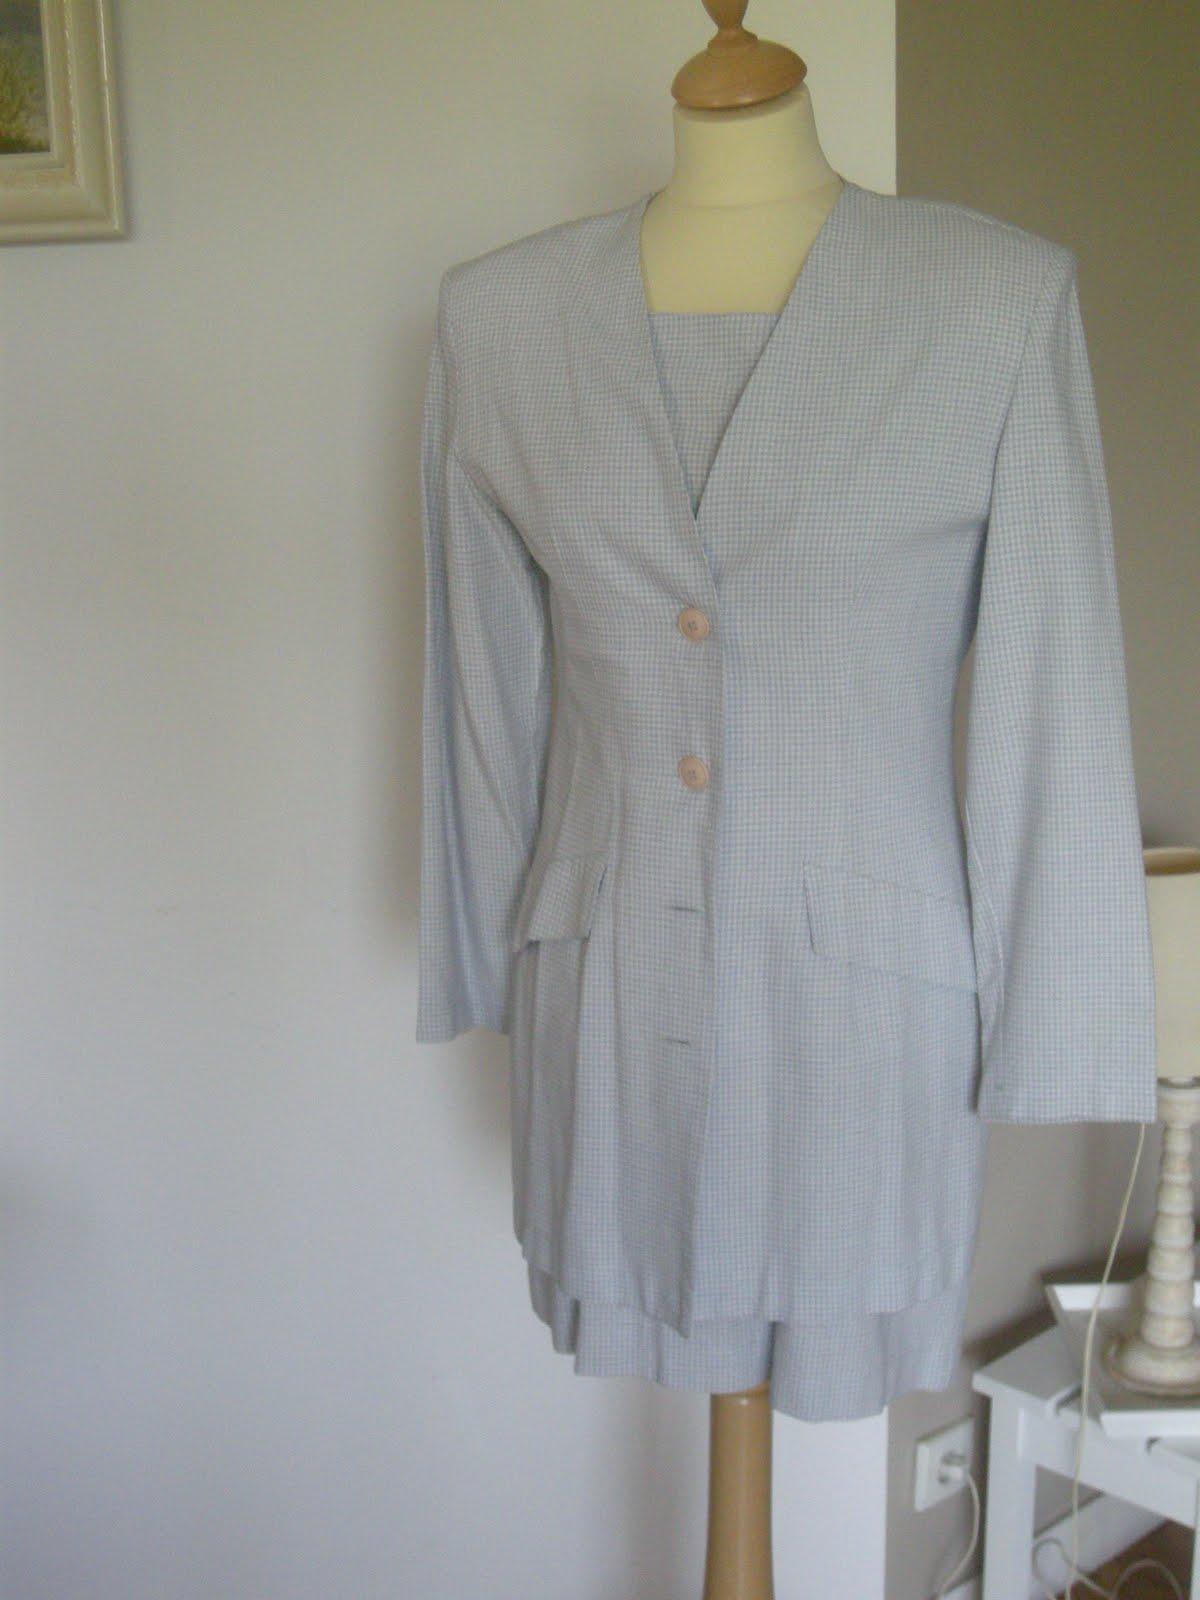 romy dressing soldes extremes tailleur robe la city 20. Black Bedroom Furniture Sets. Home Design Ideas